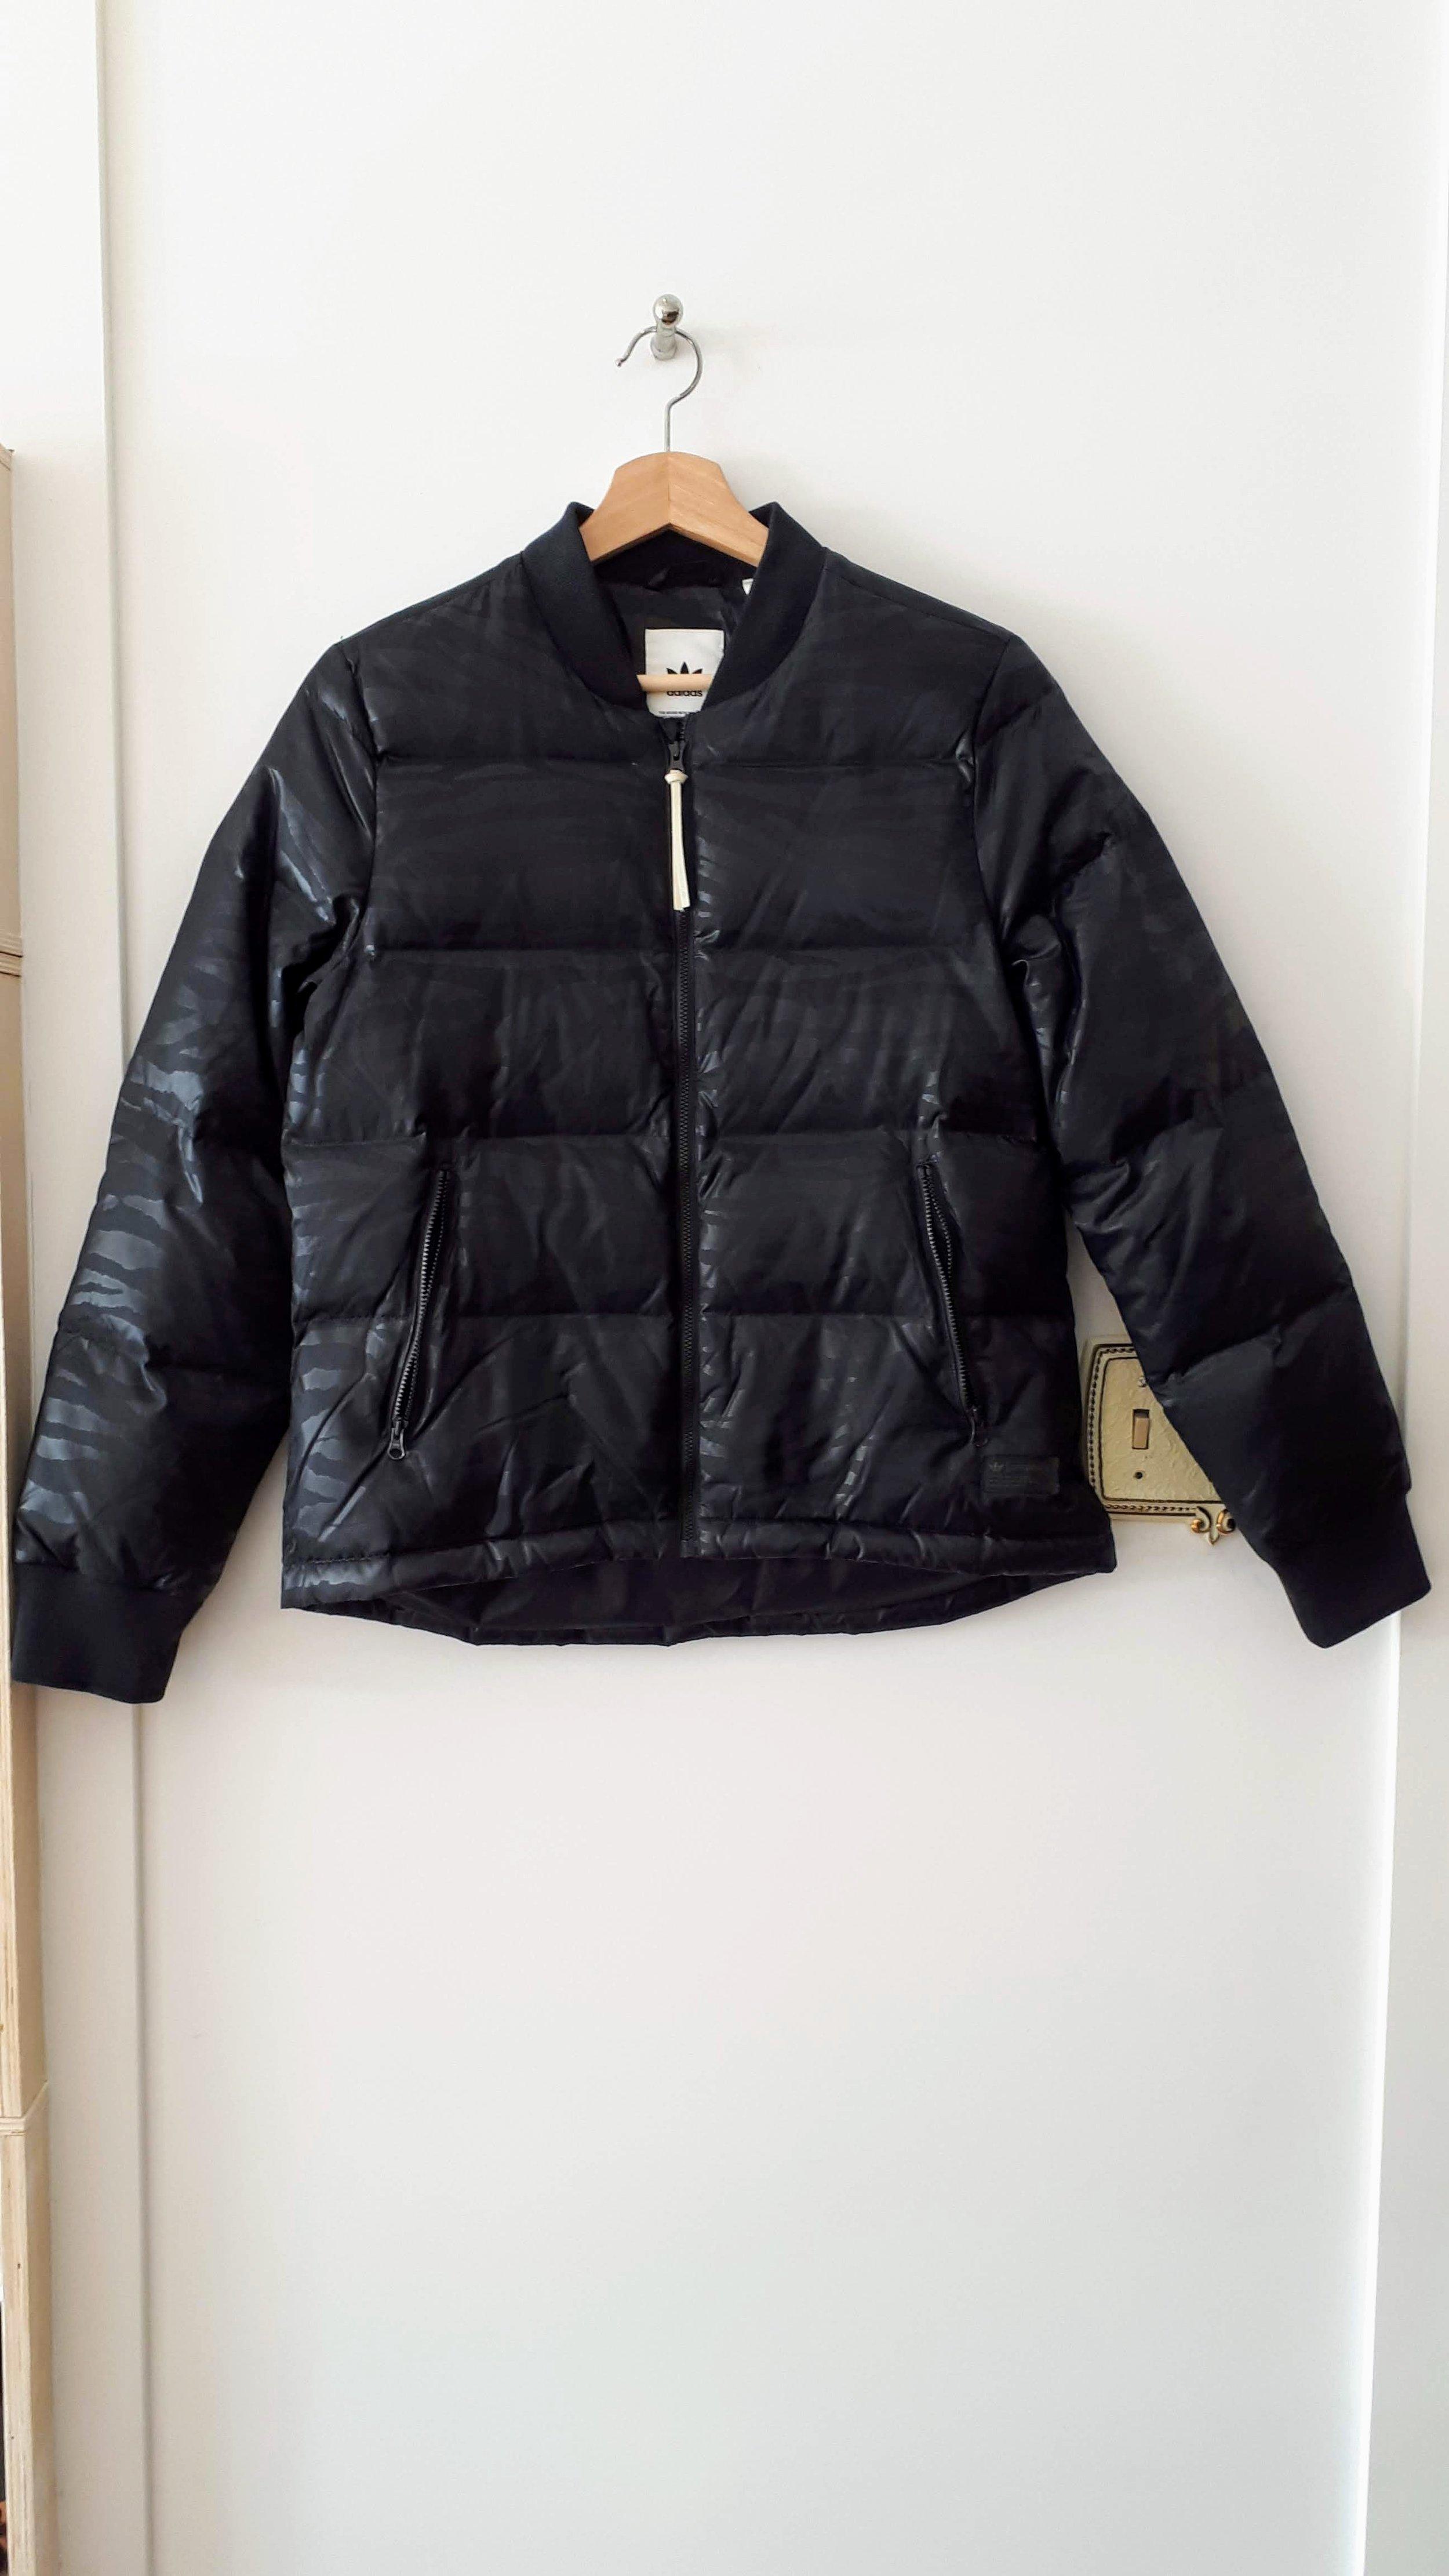 Adidas jacket; Size S, $68 (on sale: $34)